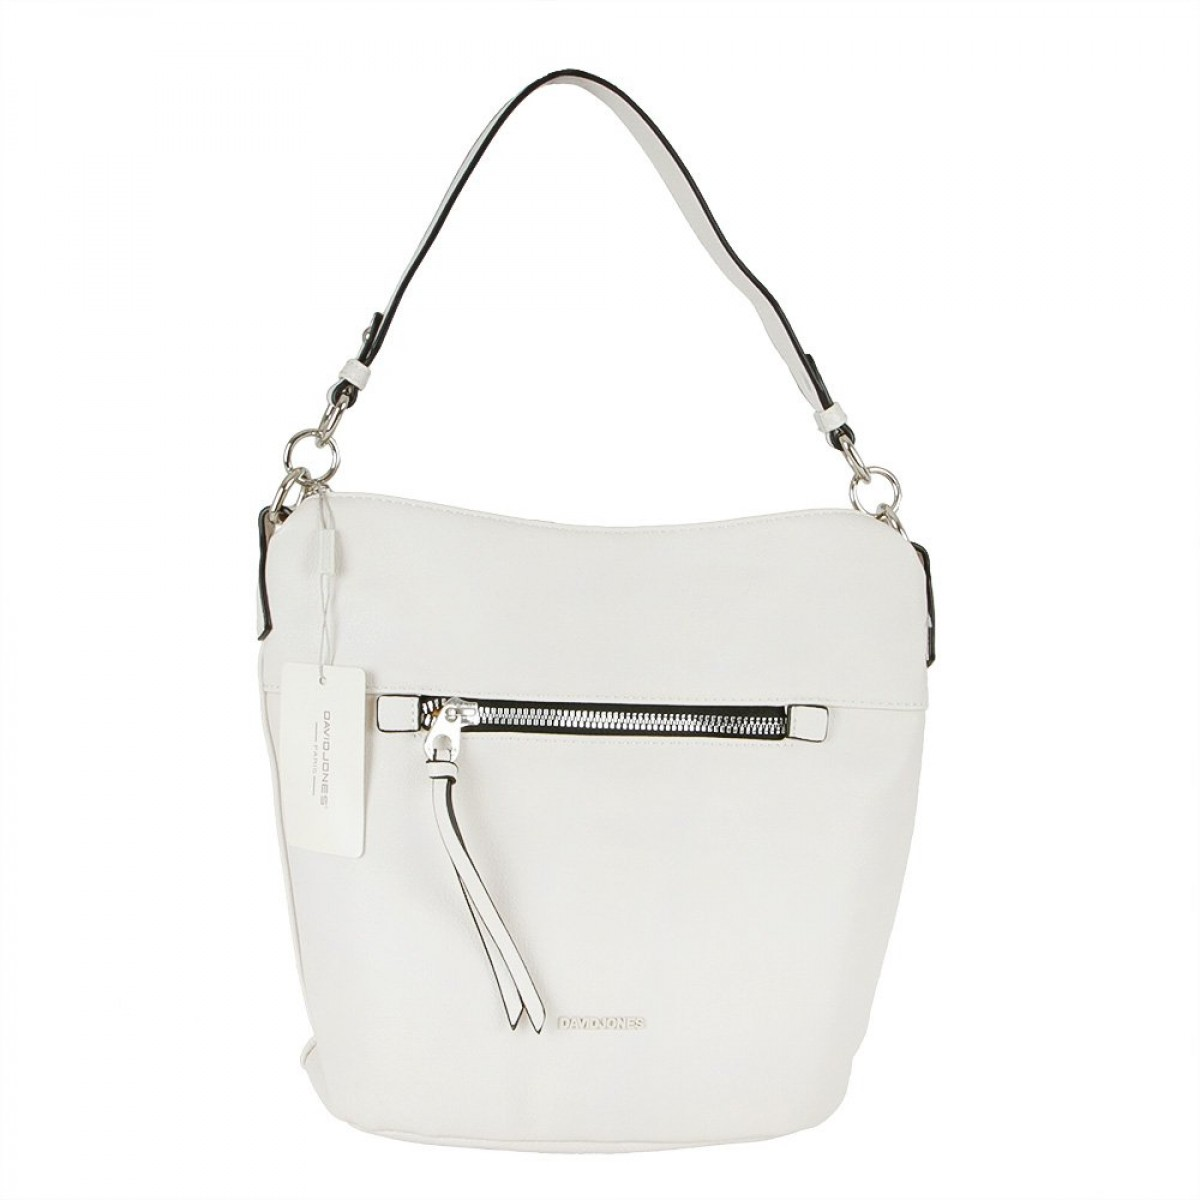 Жіноча сумка David Jones 6296-1 CREAMY WHITE